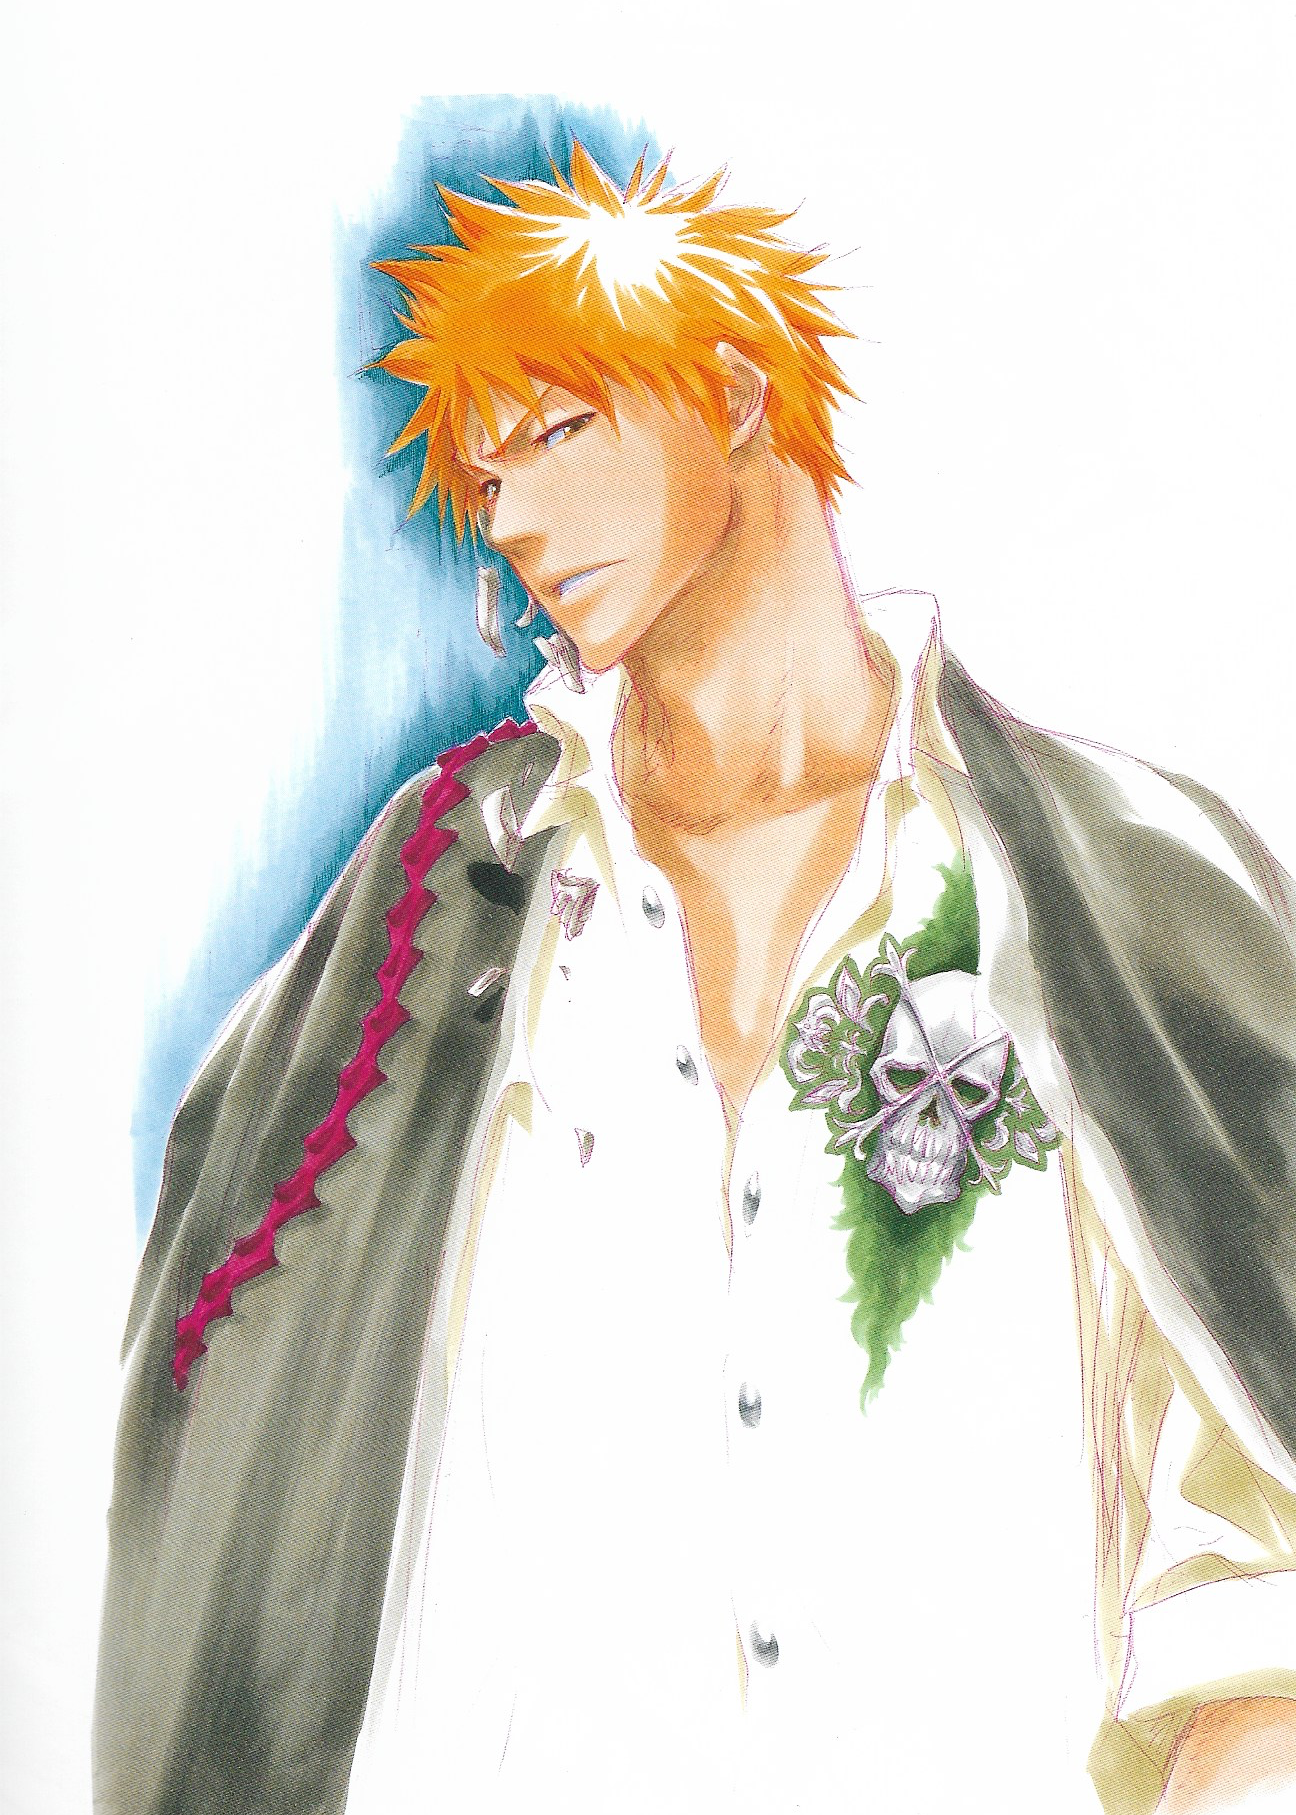 pin by zoro sasuke on bleach bleach anime anime anime boy